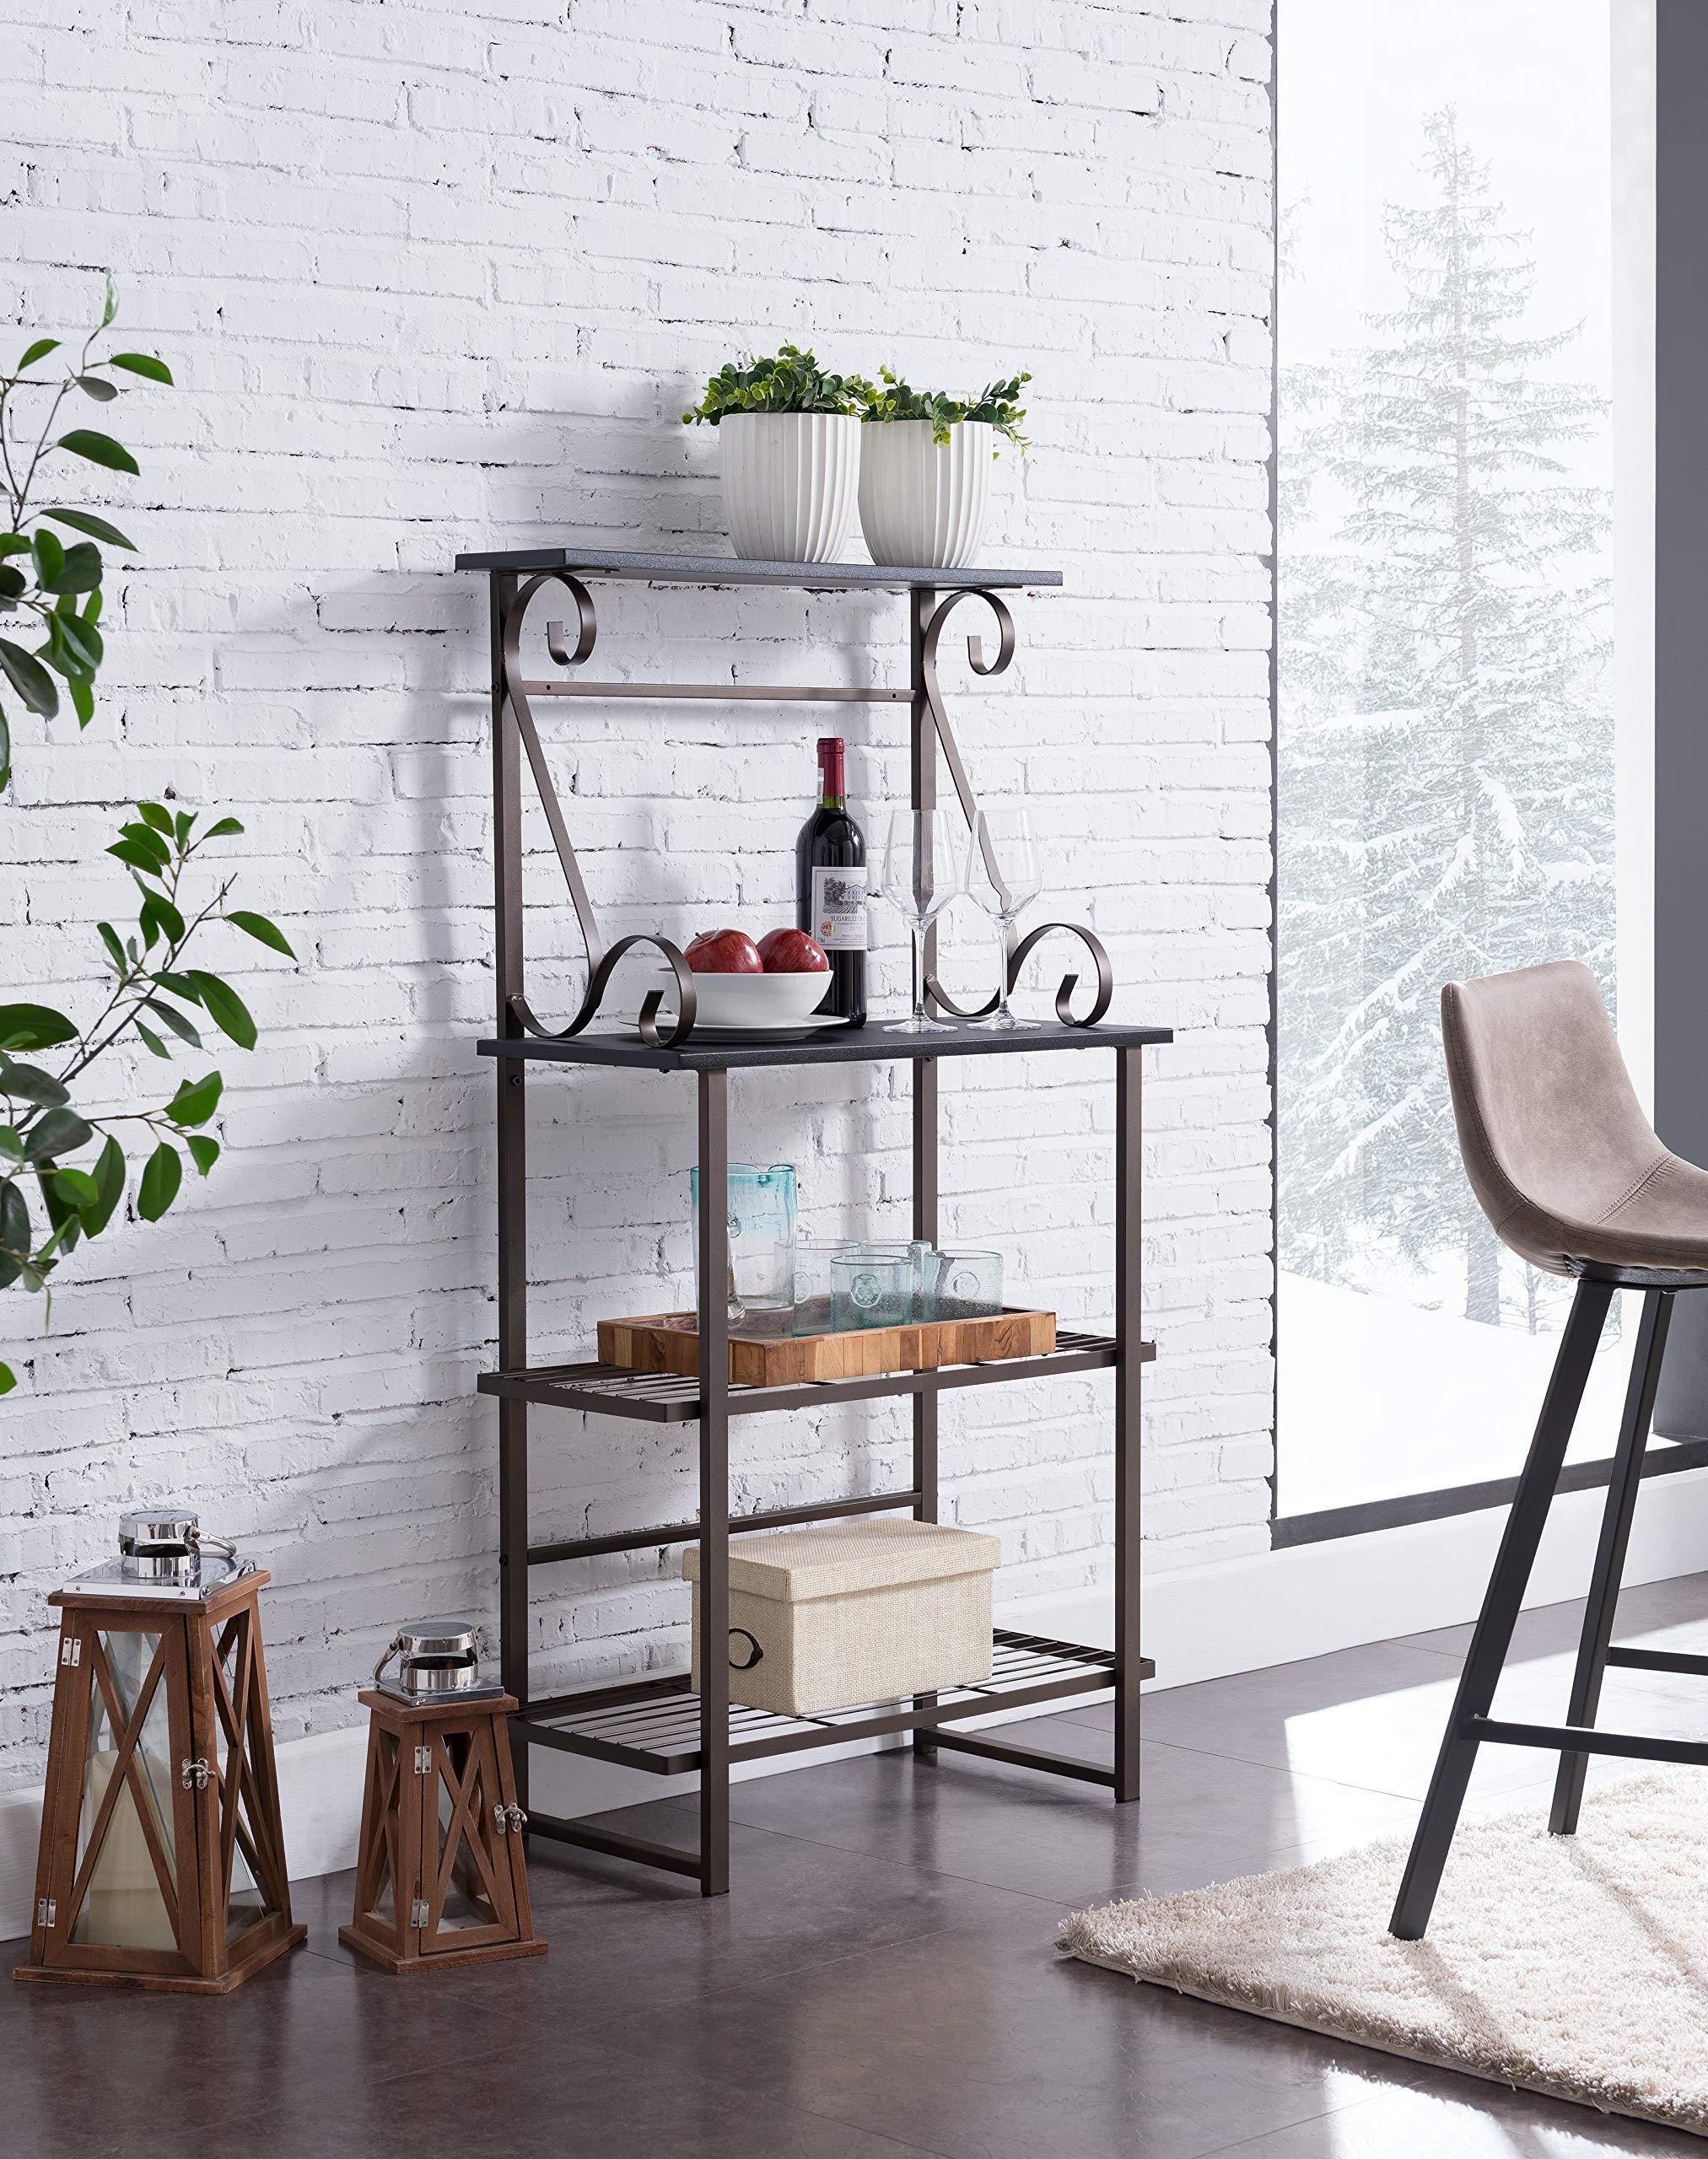 Kings Brand Furniture - Covington Metal Kitchen Baker's Rack, Pewter by Kings Brand Furniture